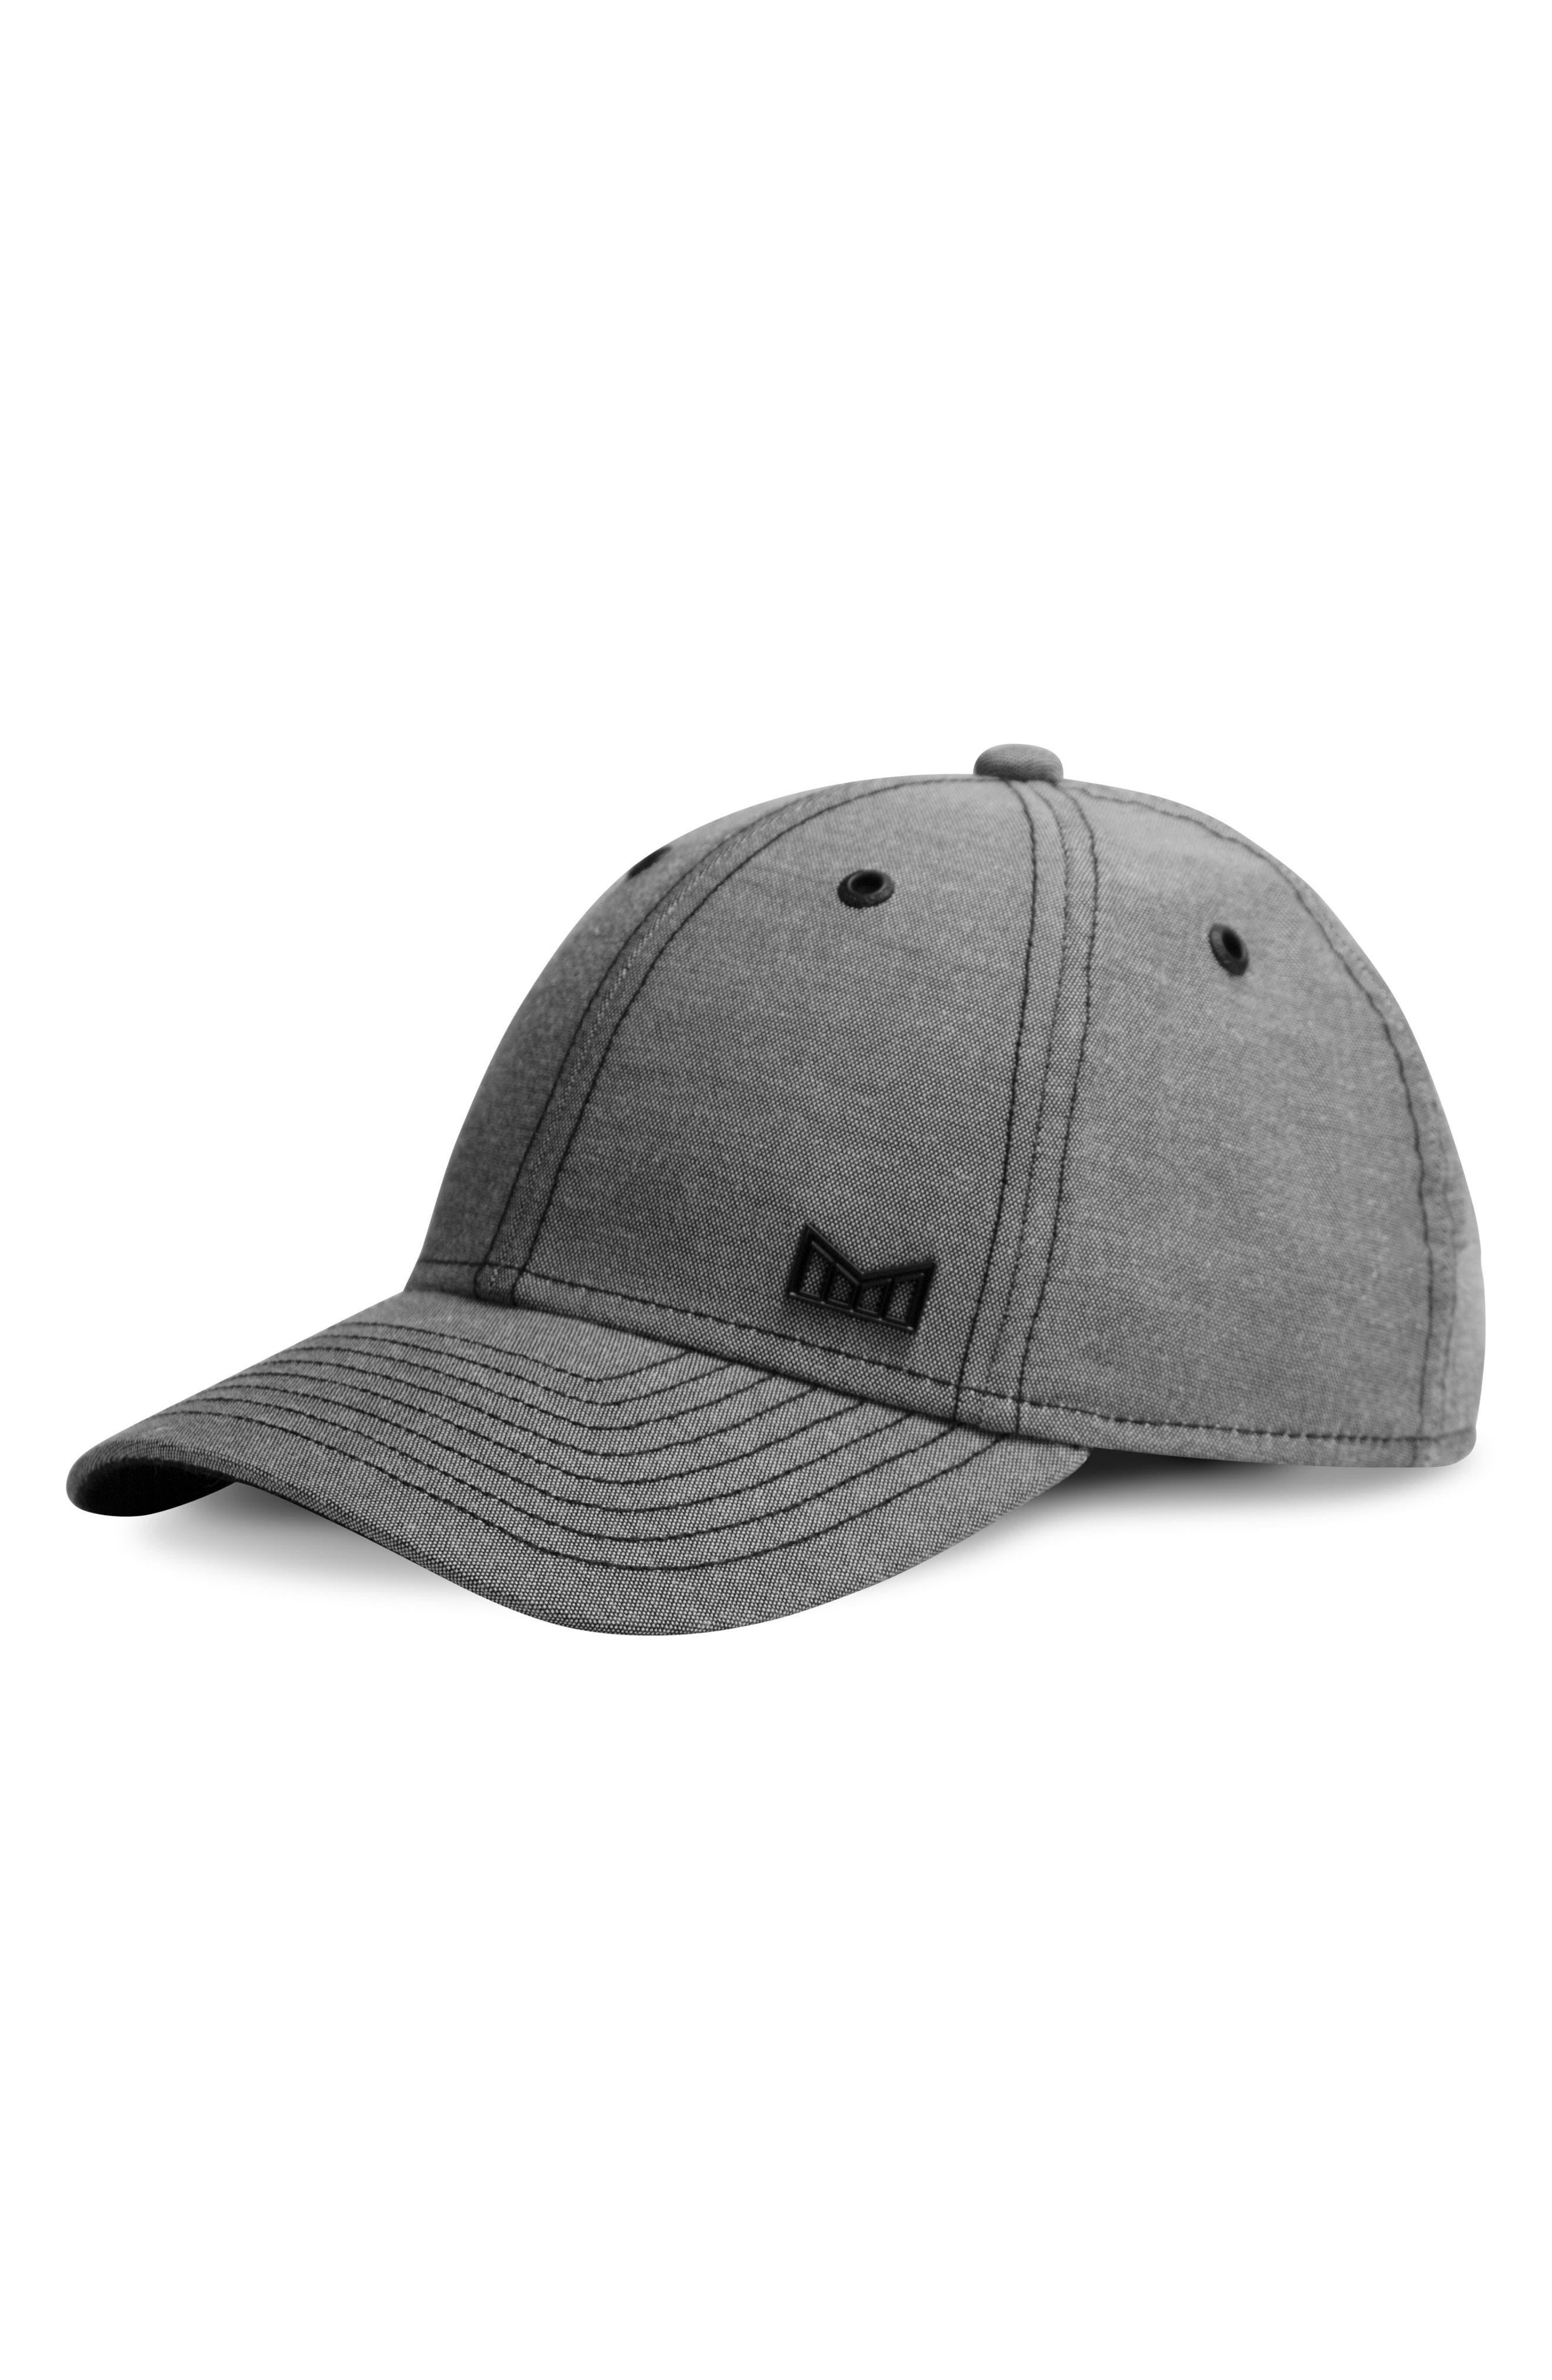 official photos 71871 c00f8 ... wholesale melin scholar snapback baseball cap c9fd2 4fa9f